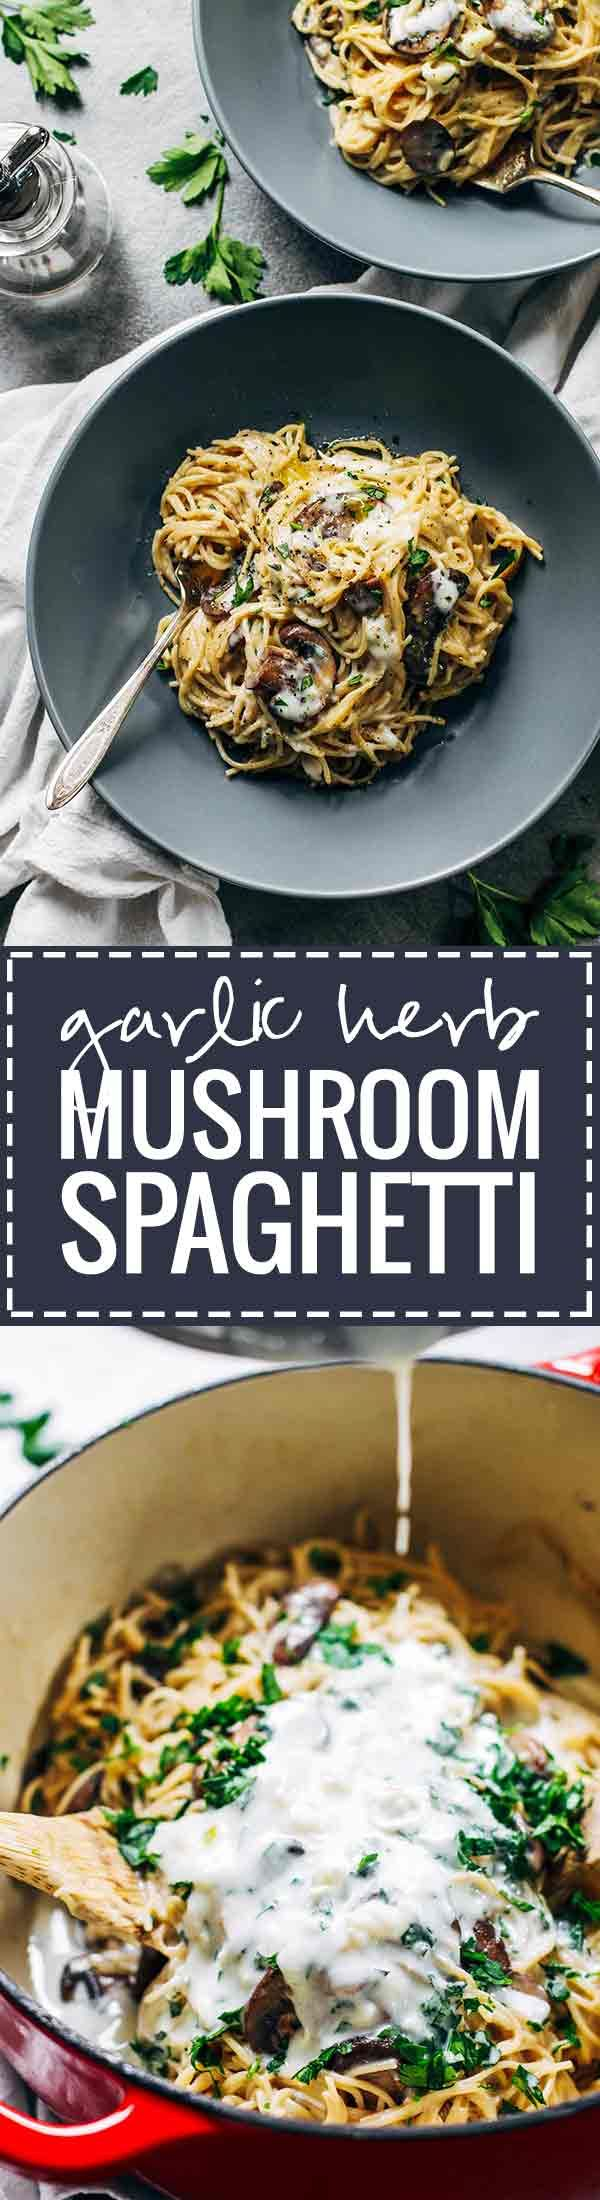 Creamy Garlic Herb Mushroom Spaghetti - this recipe is total comfort food…